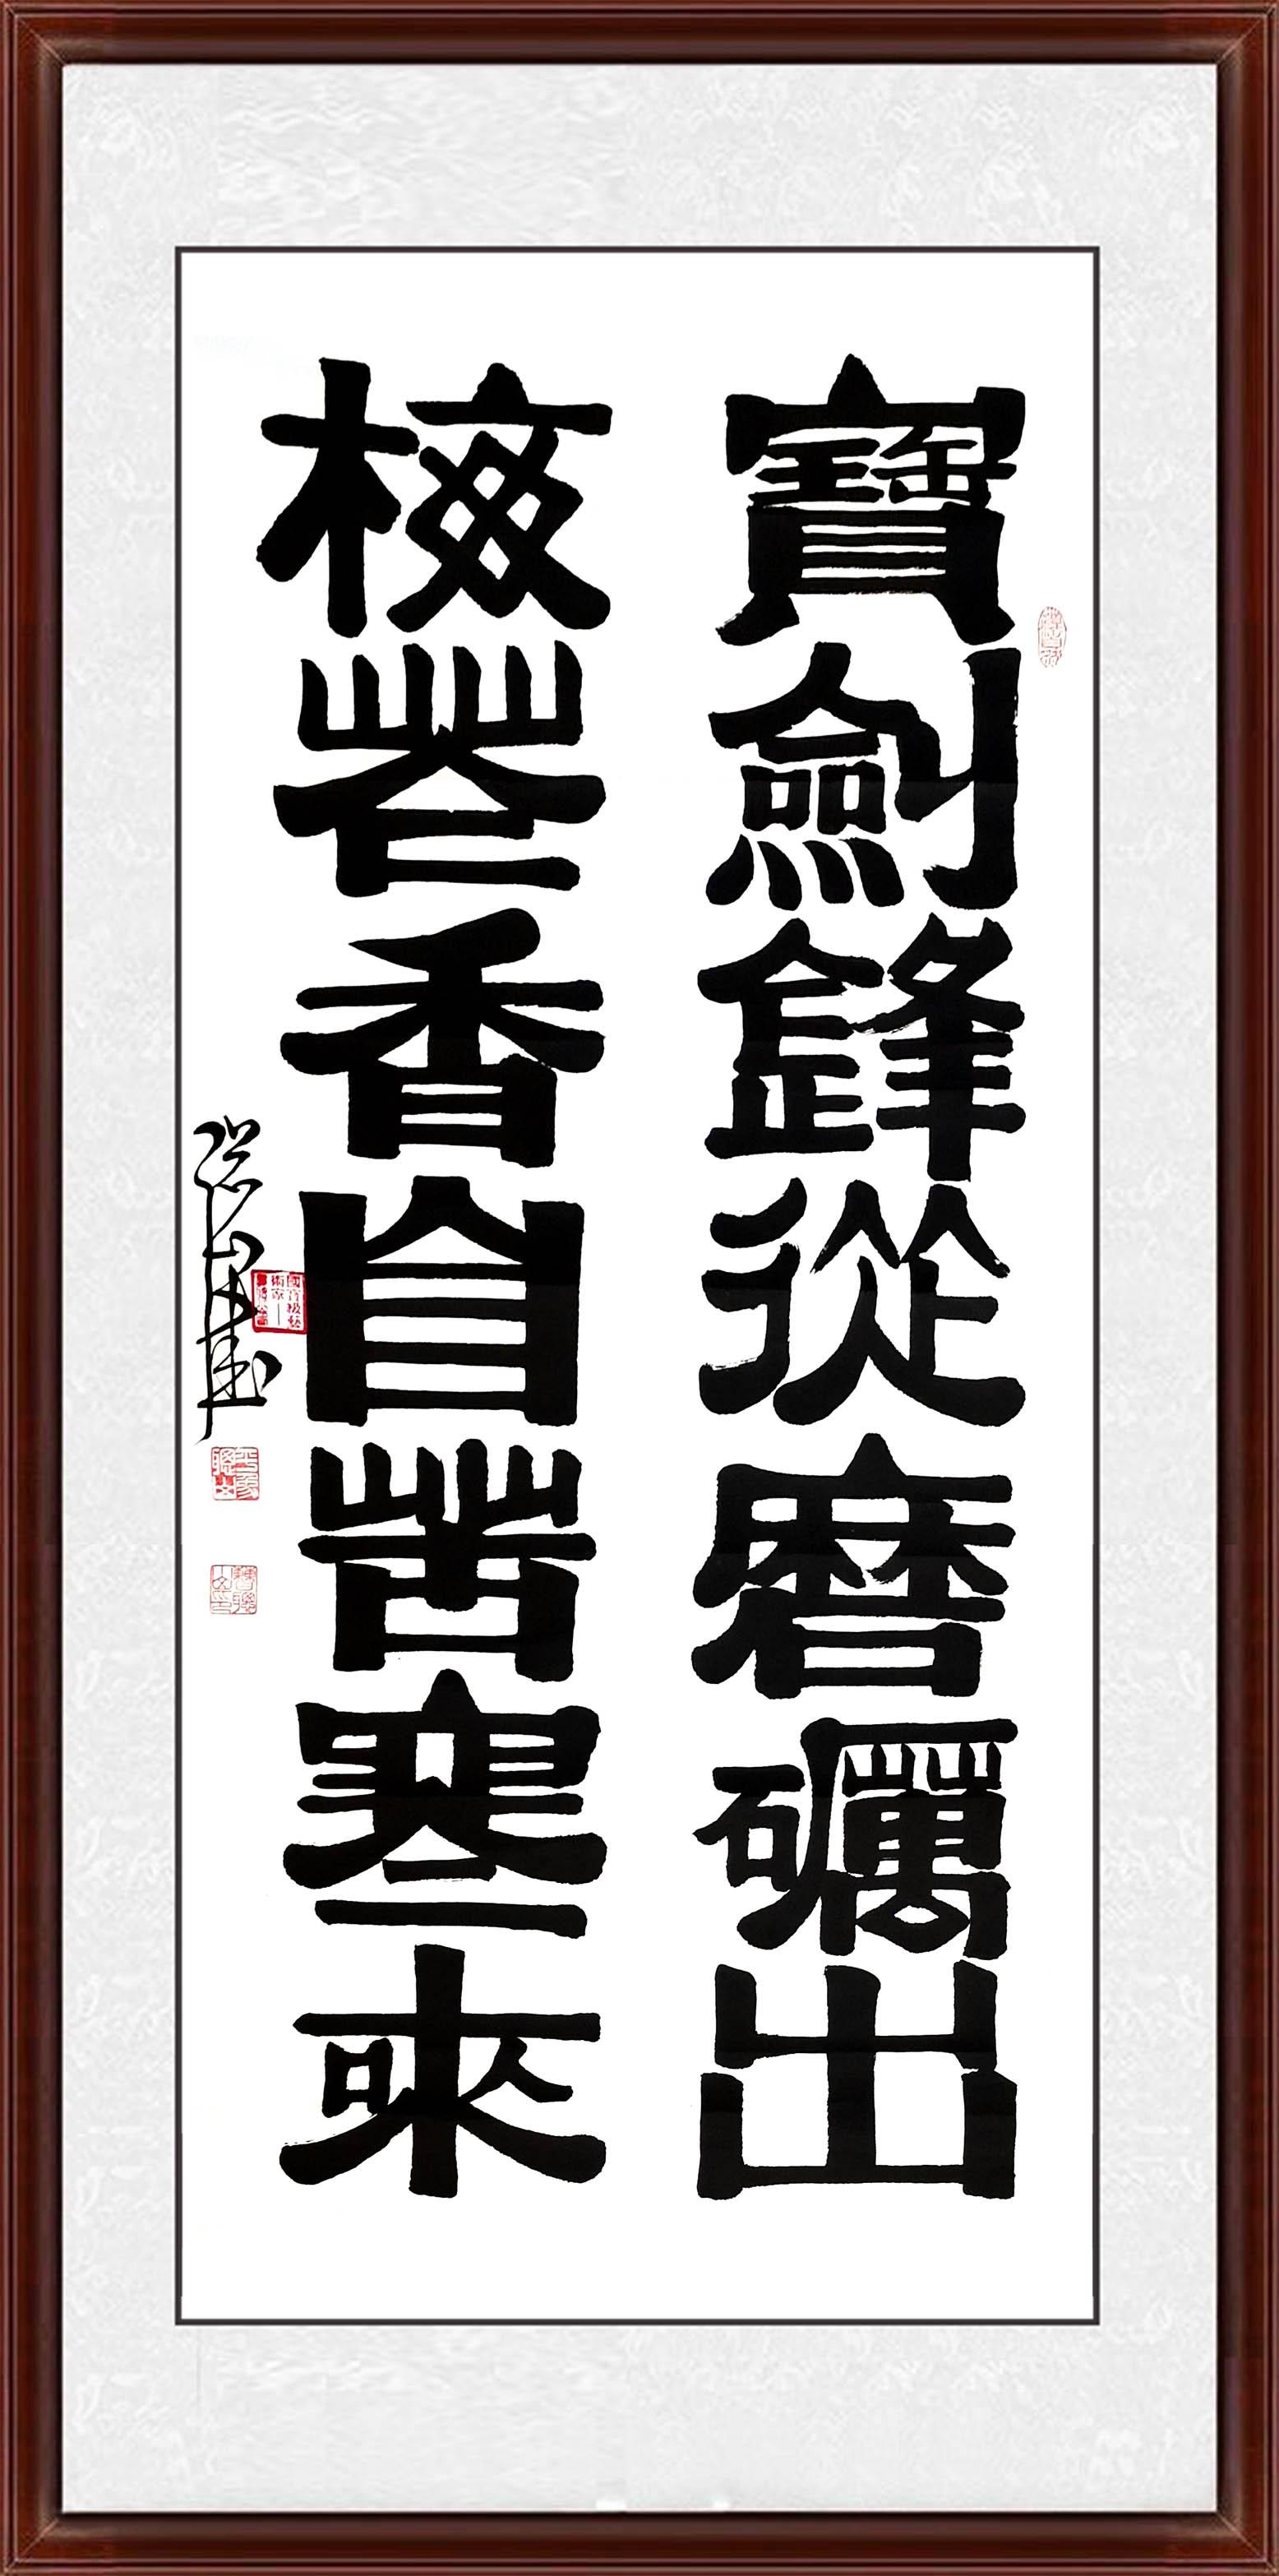 C:\Users\Administrator\Desktop\王明超-曹聪山-欧洲网\15.jpg